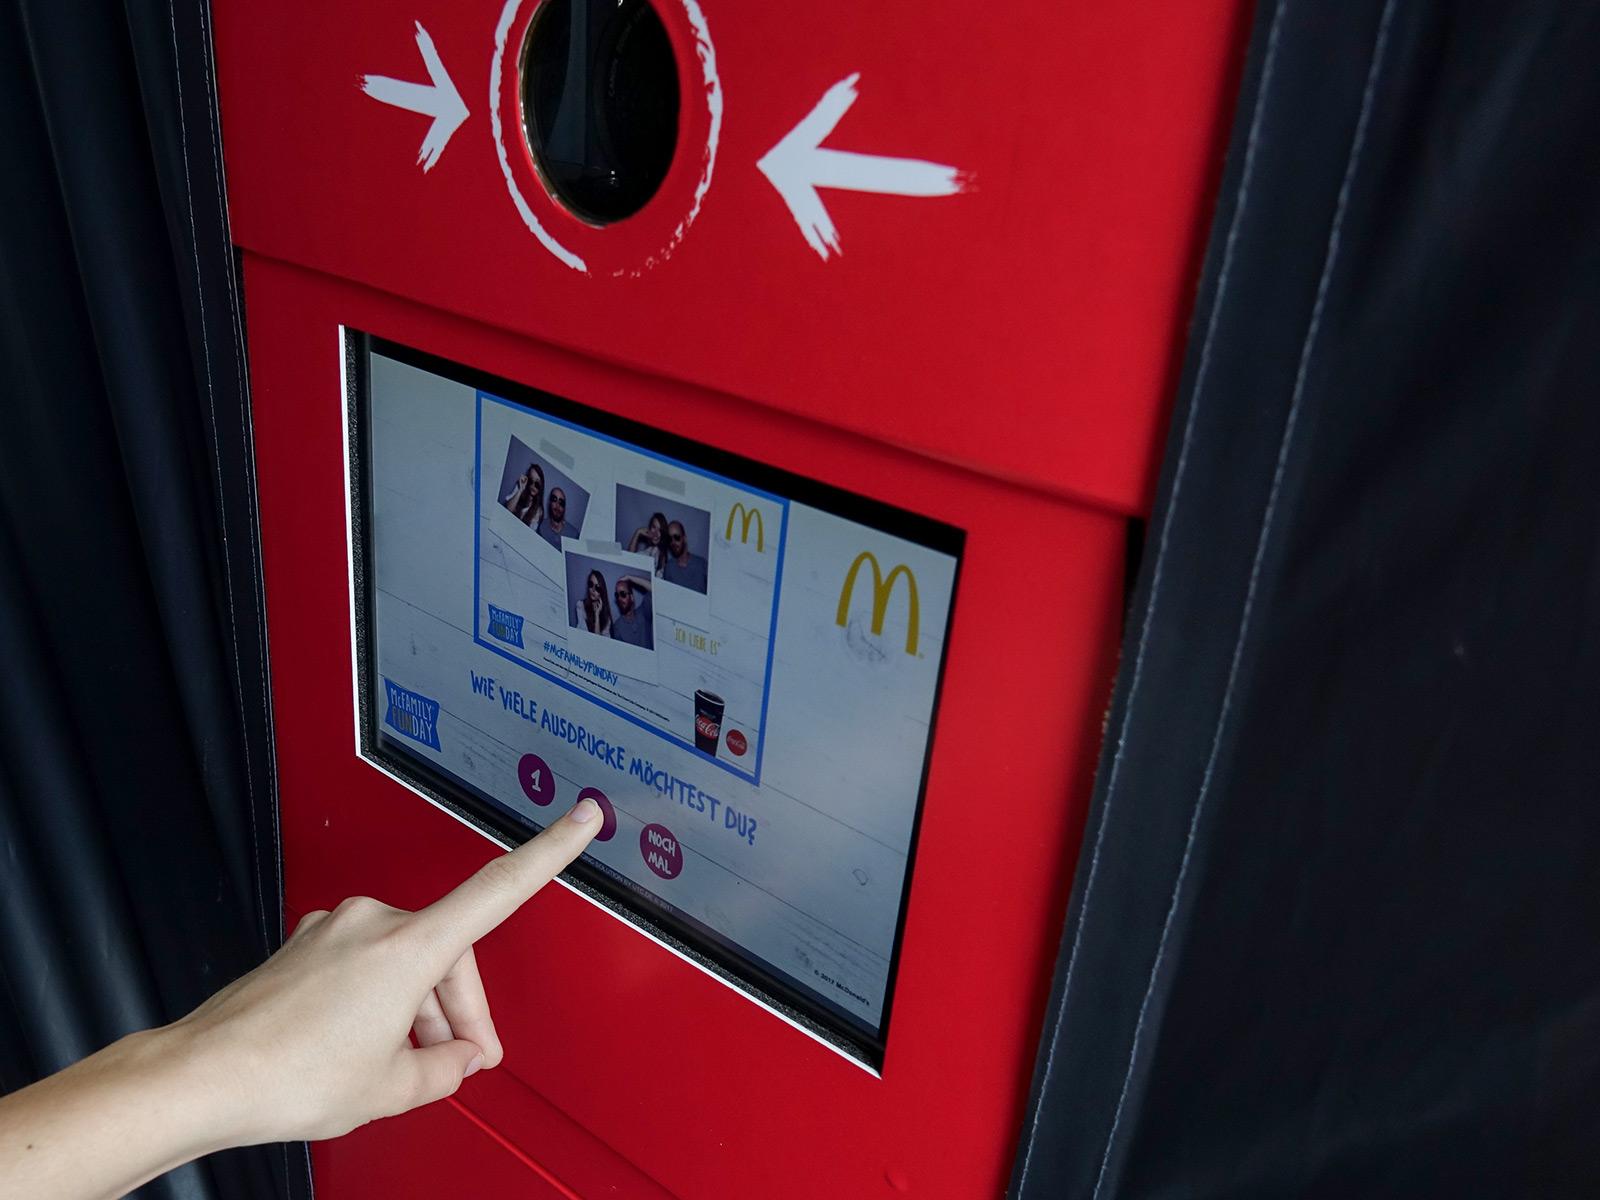 Fotoautomat Bildschirm